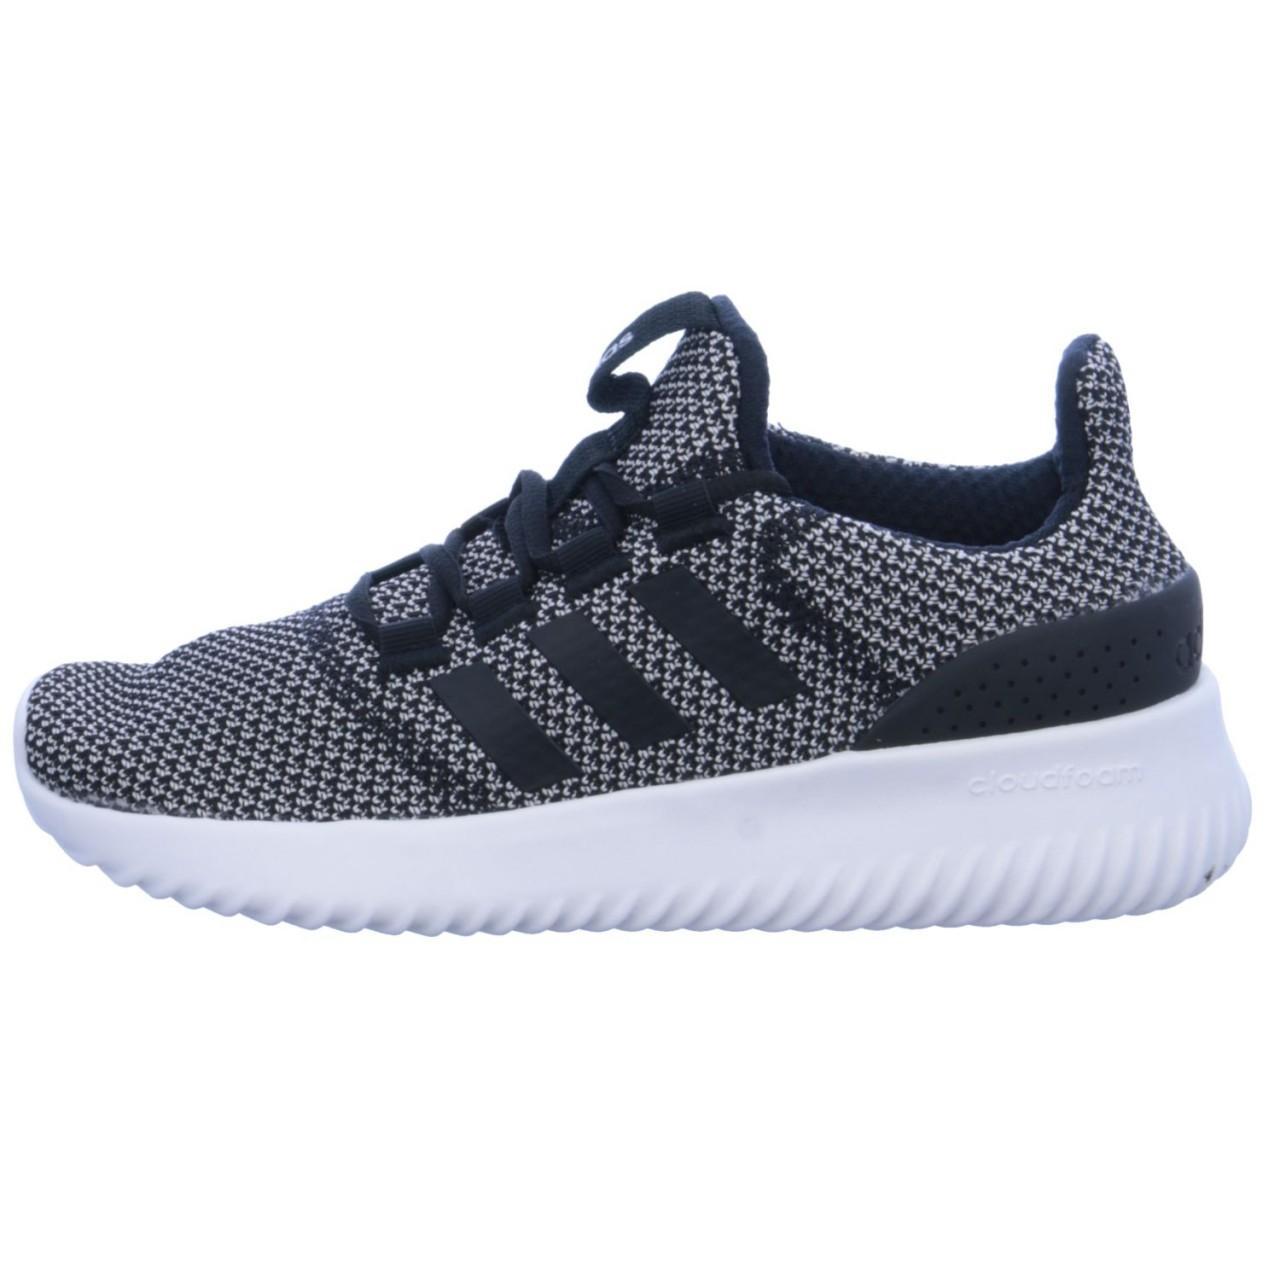 huge discount 42995 8fad4 Adidas - Blue Wo Trainers Black Cloudfoam Ultimate - Lyst. View fullscreen